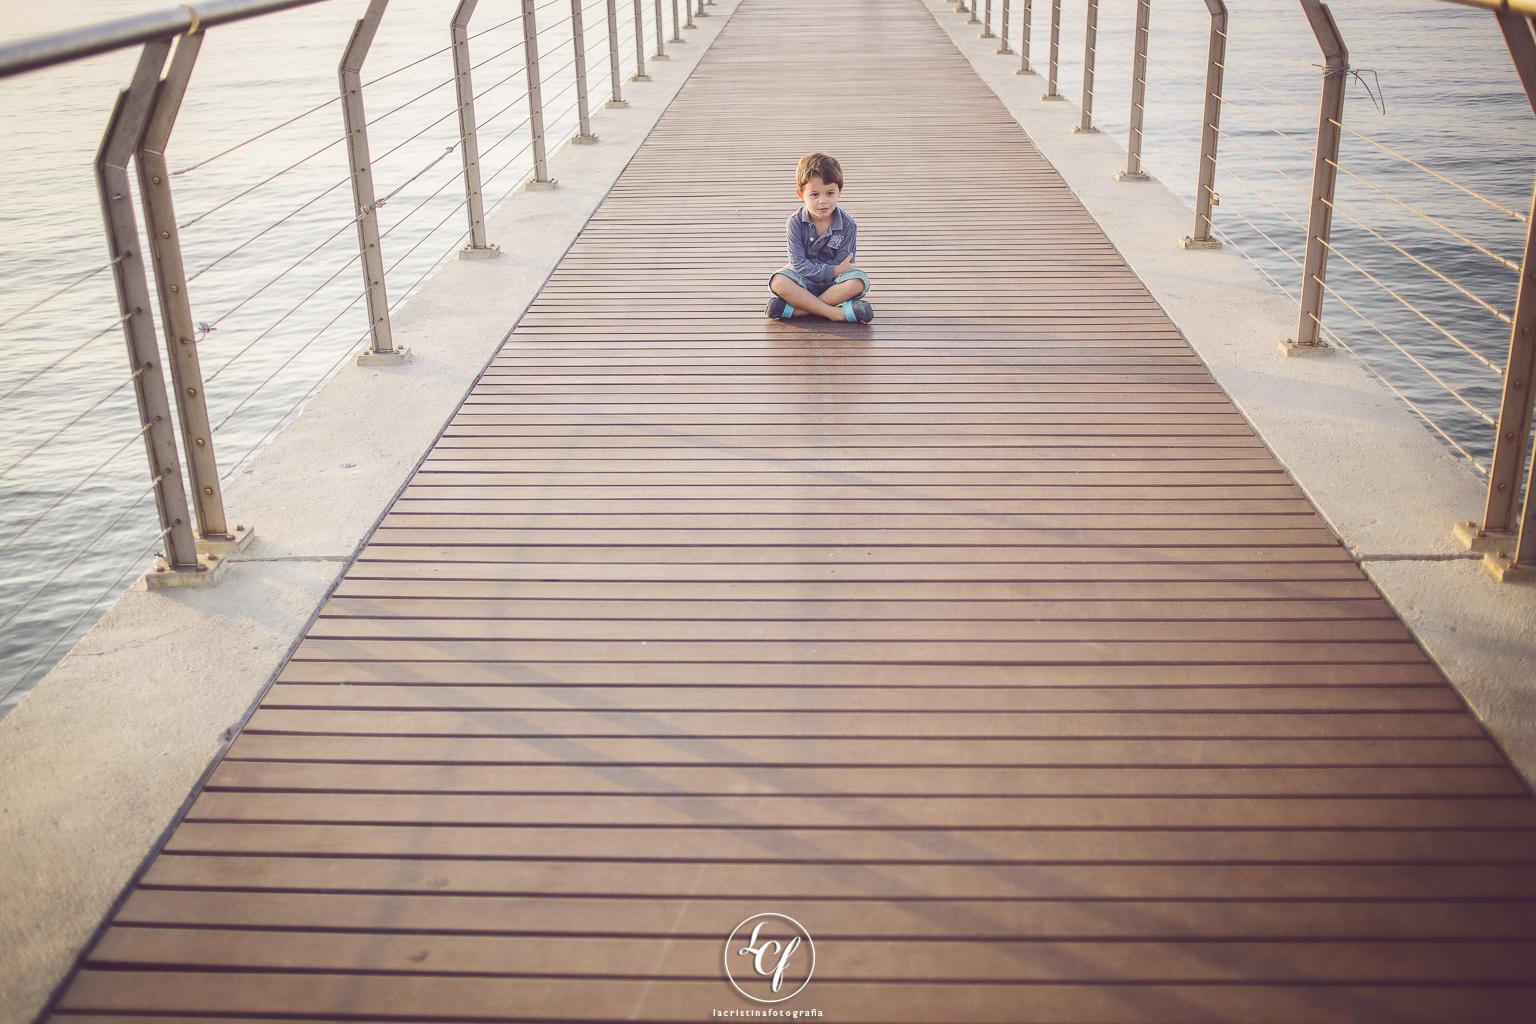 Fotógrafo familiar :: Fotografía familiar Badalona :: Fotografía familiar en la playa :: Fotógrafo familiar pont del petroli